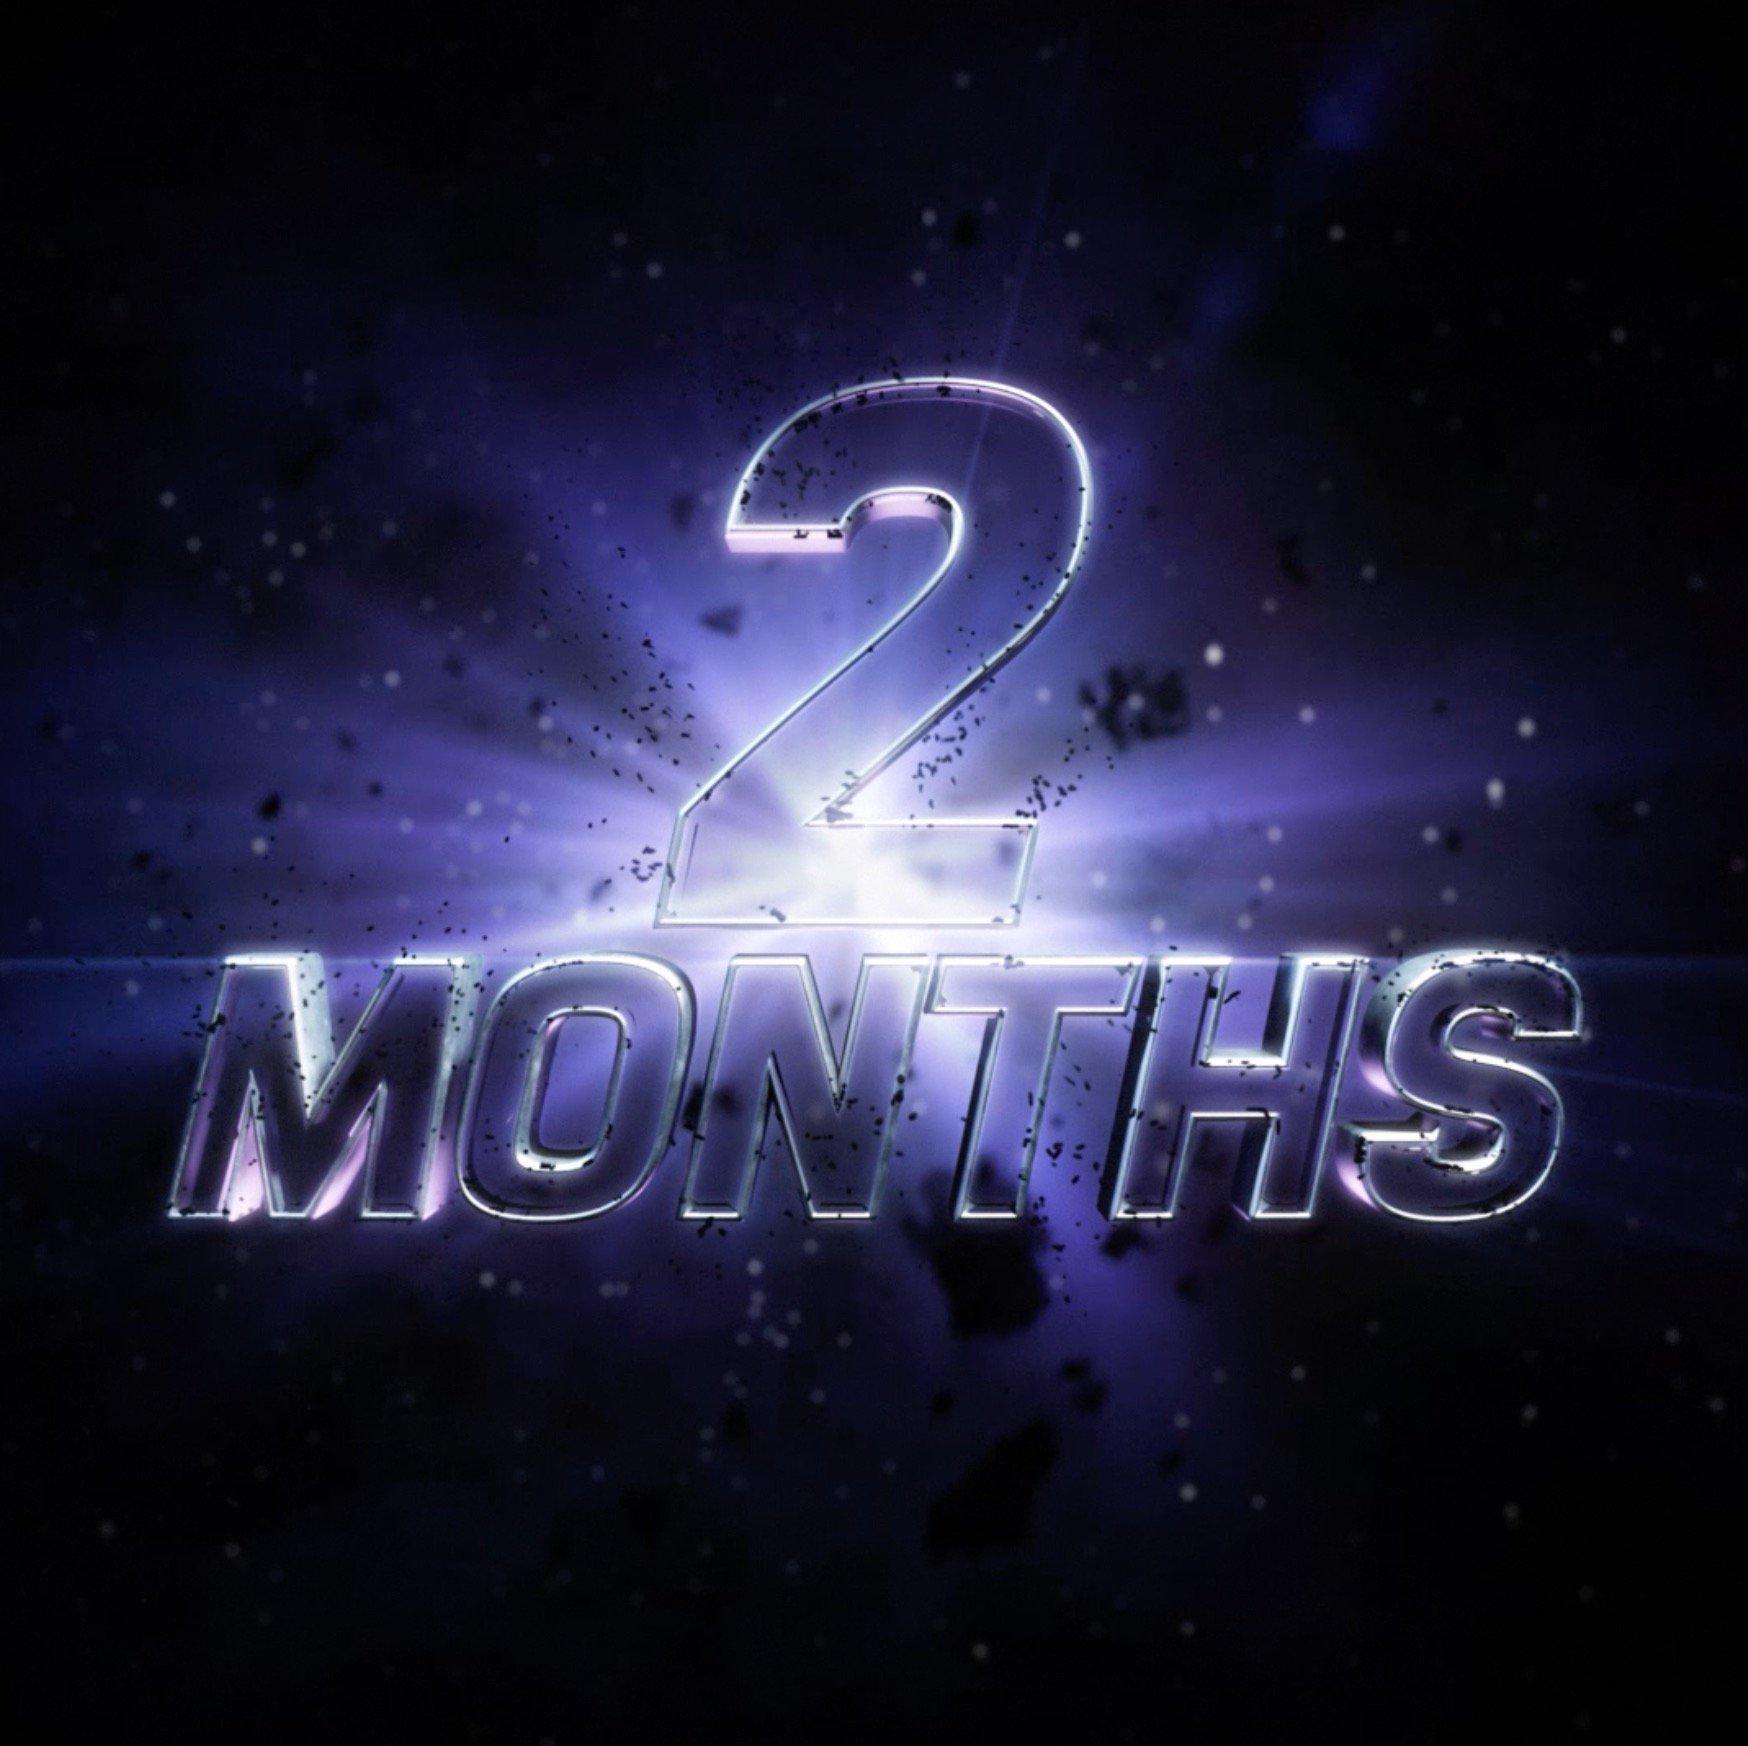 Two months until Marvel Studios' #AvengersEndgame. See the film in theaters April 26. https://t.co/ElB61y7Iiu